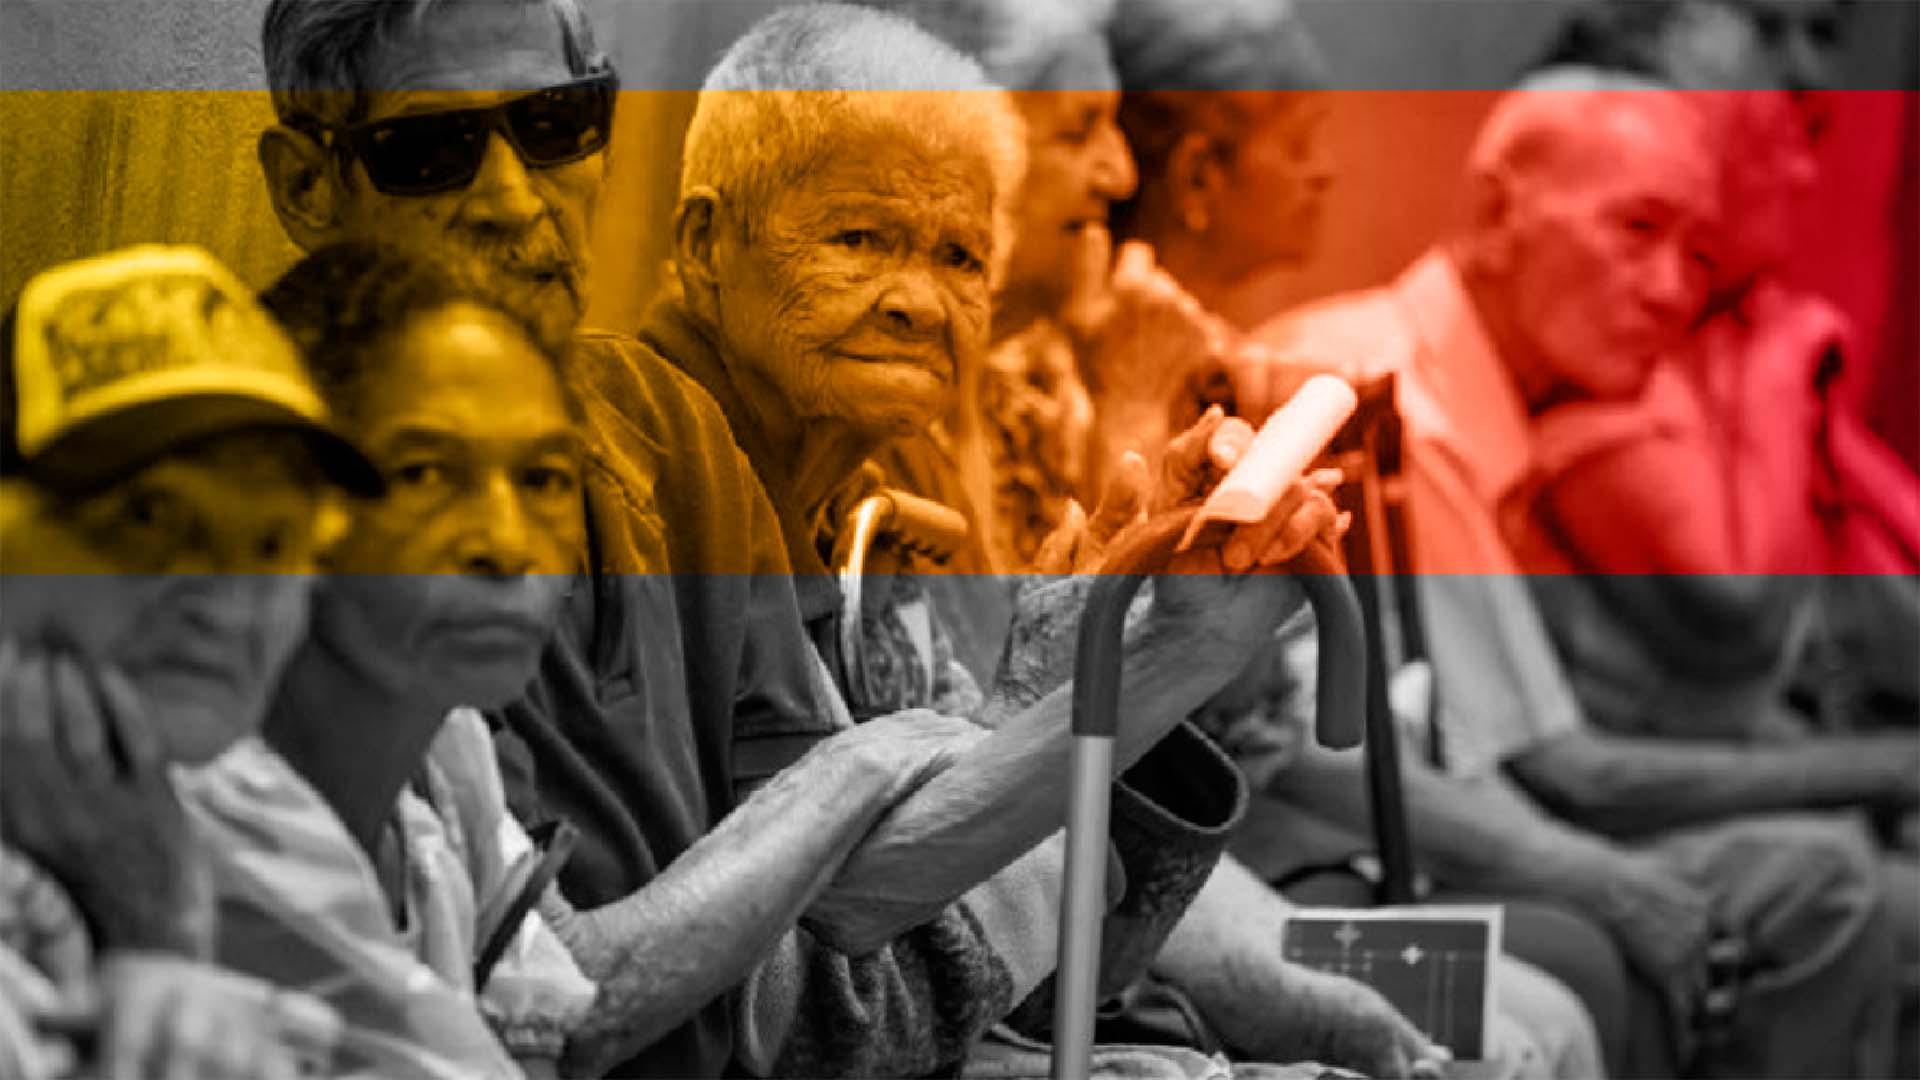 185 ancianos fueron asesinados durante primer semestre de 2020 en Venezuela